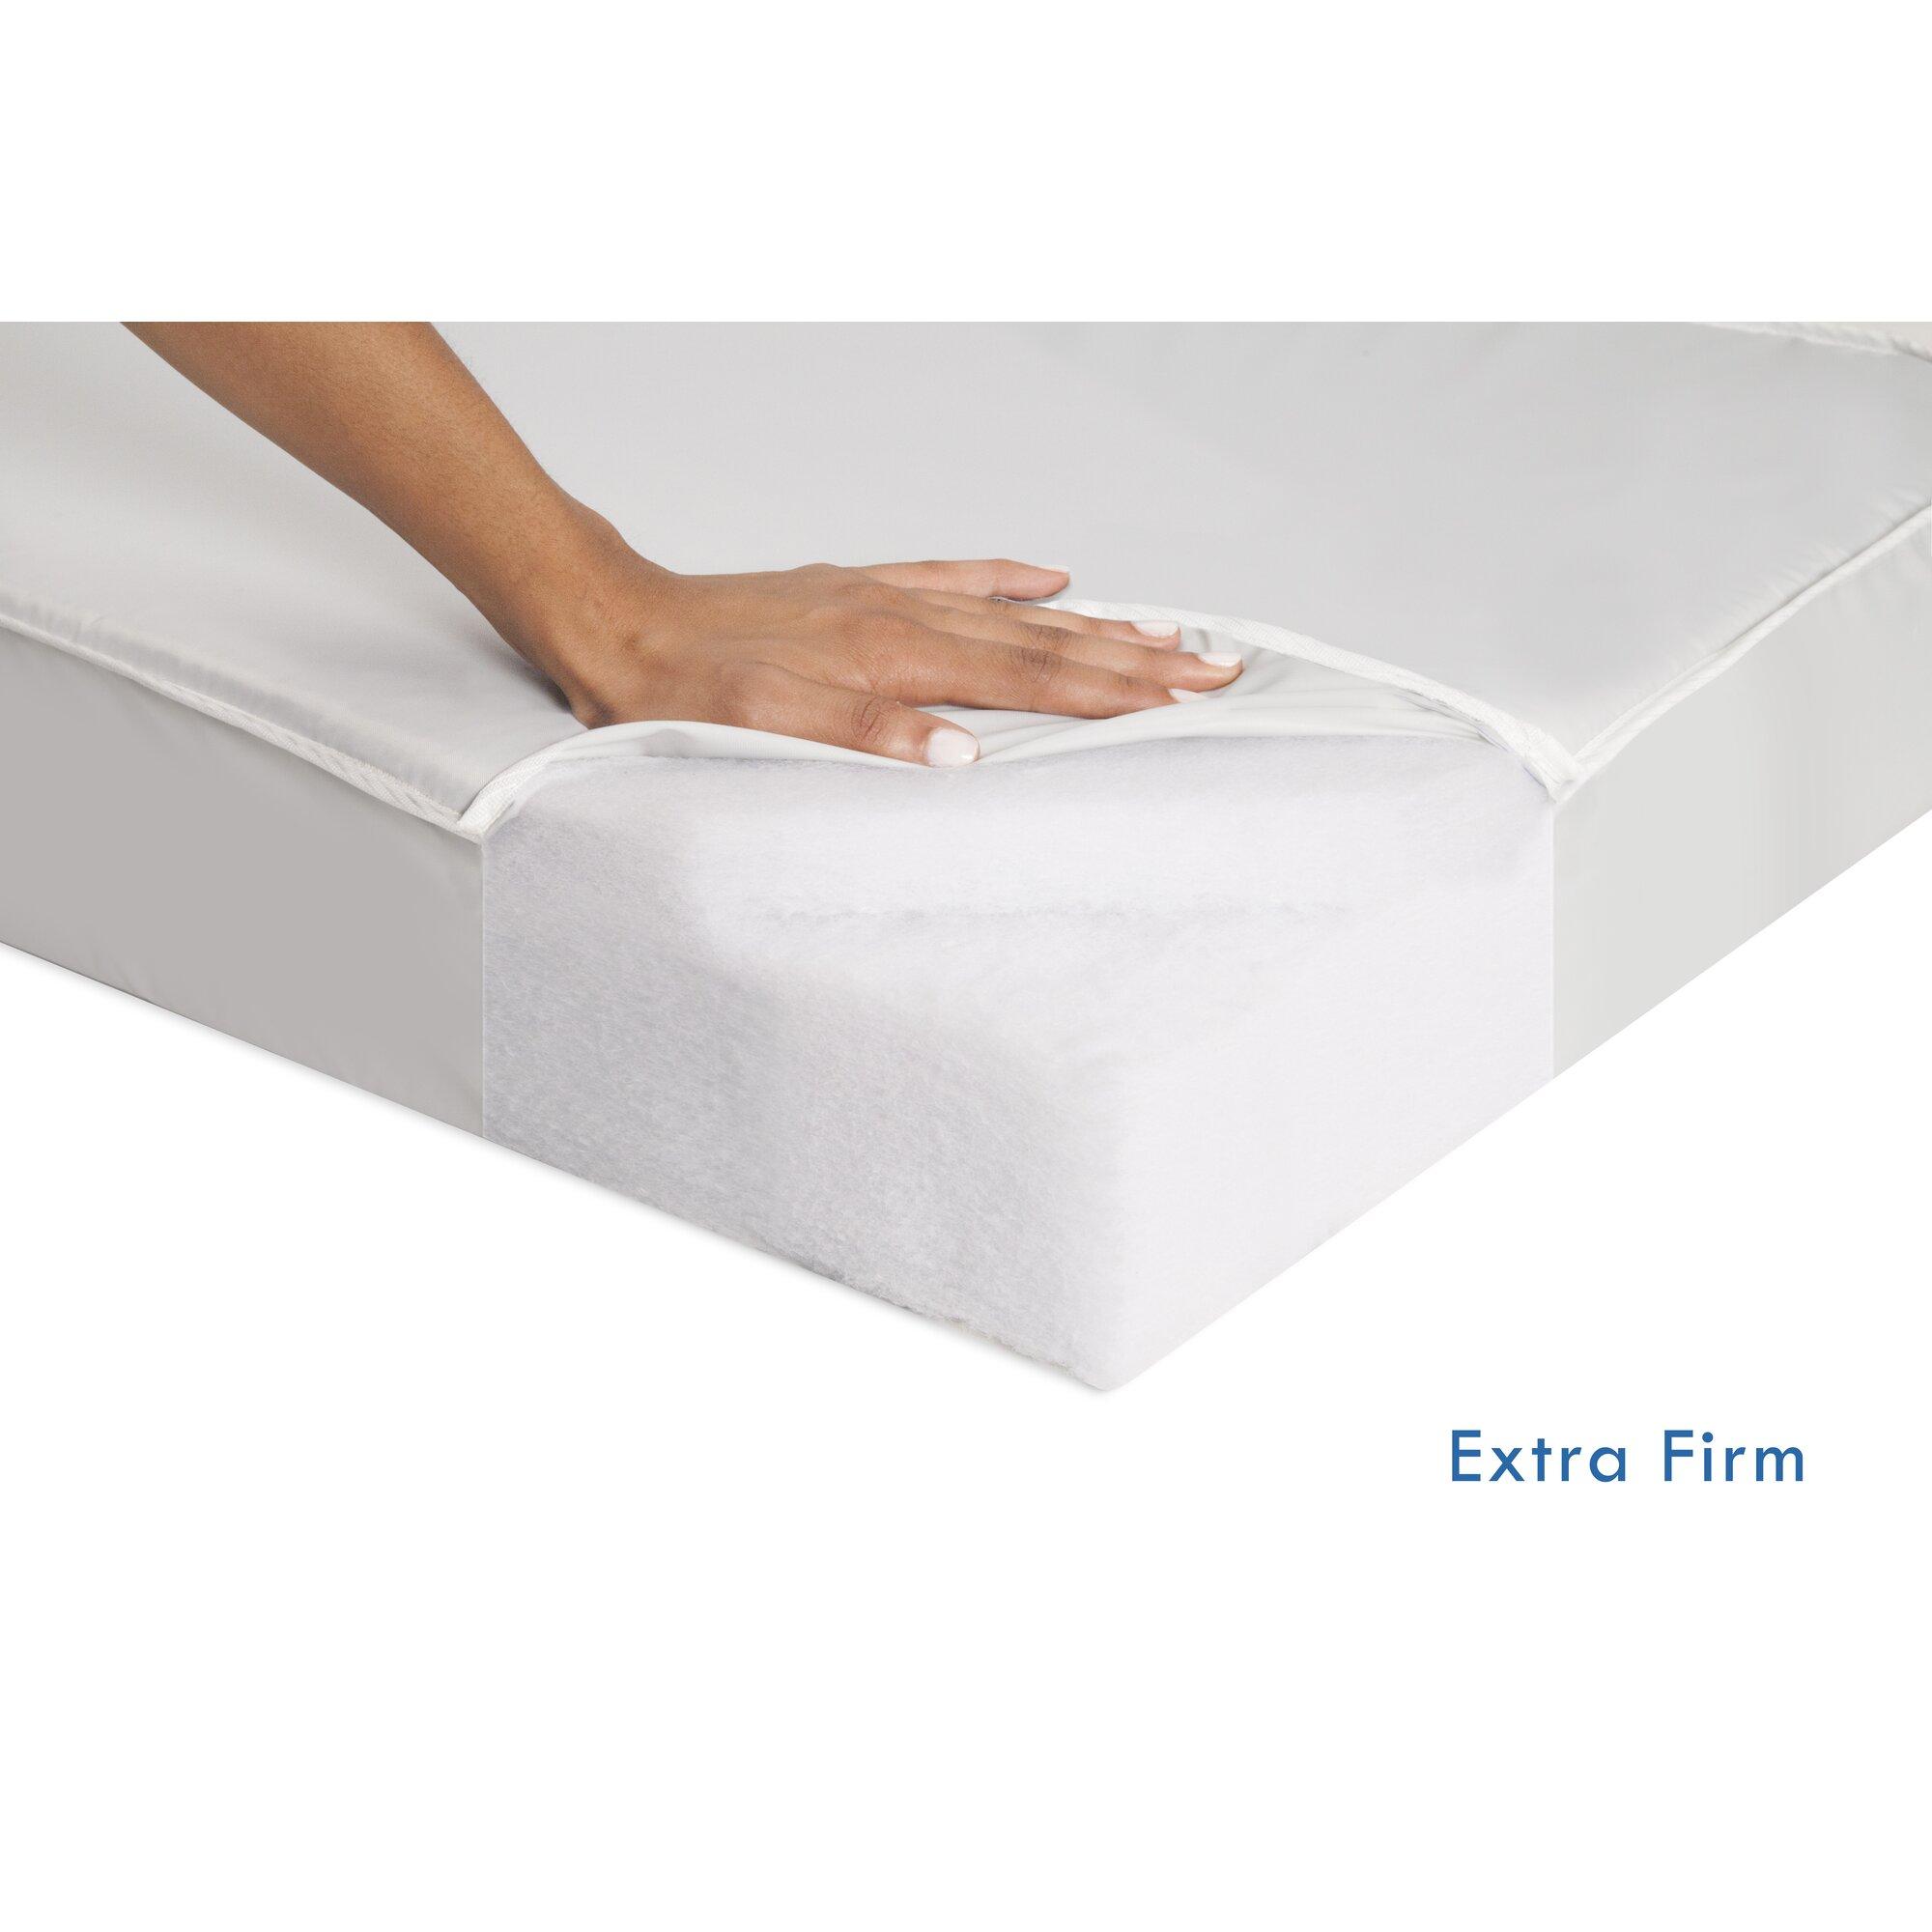 Foam Crib Mattress Topper DaVinci 100% Non-toxic Complete Mini Lightweight Extra ...